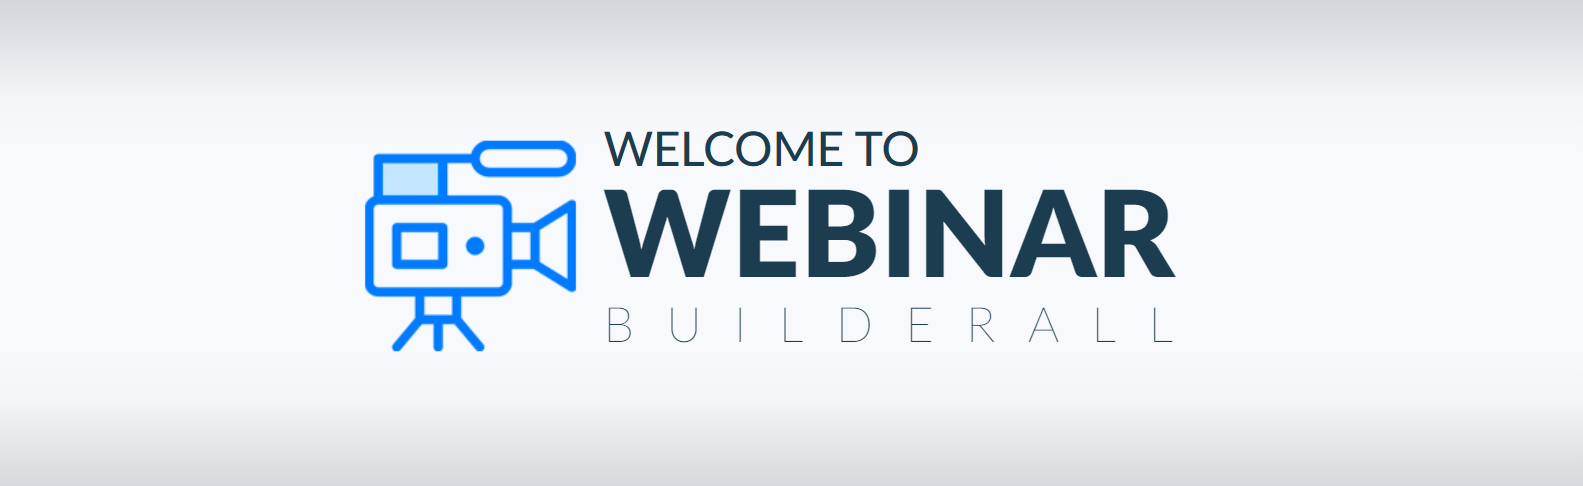 builderall webinar app